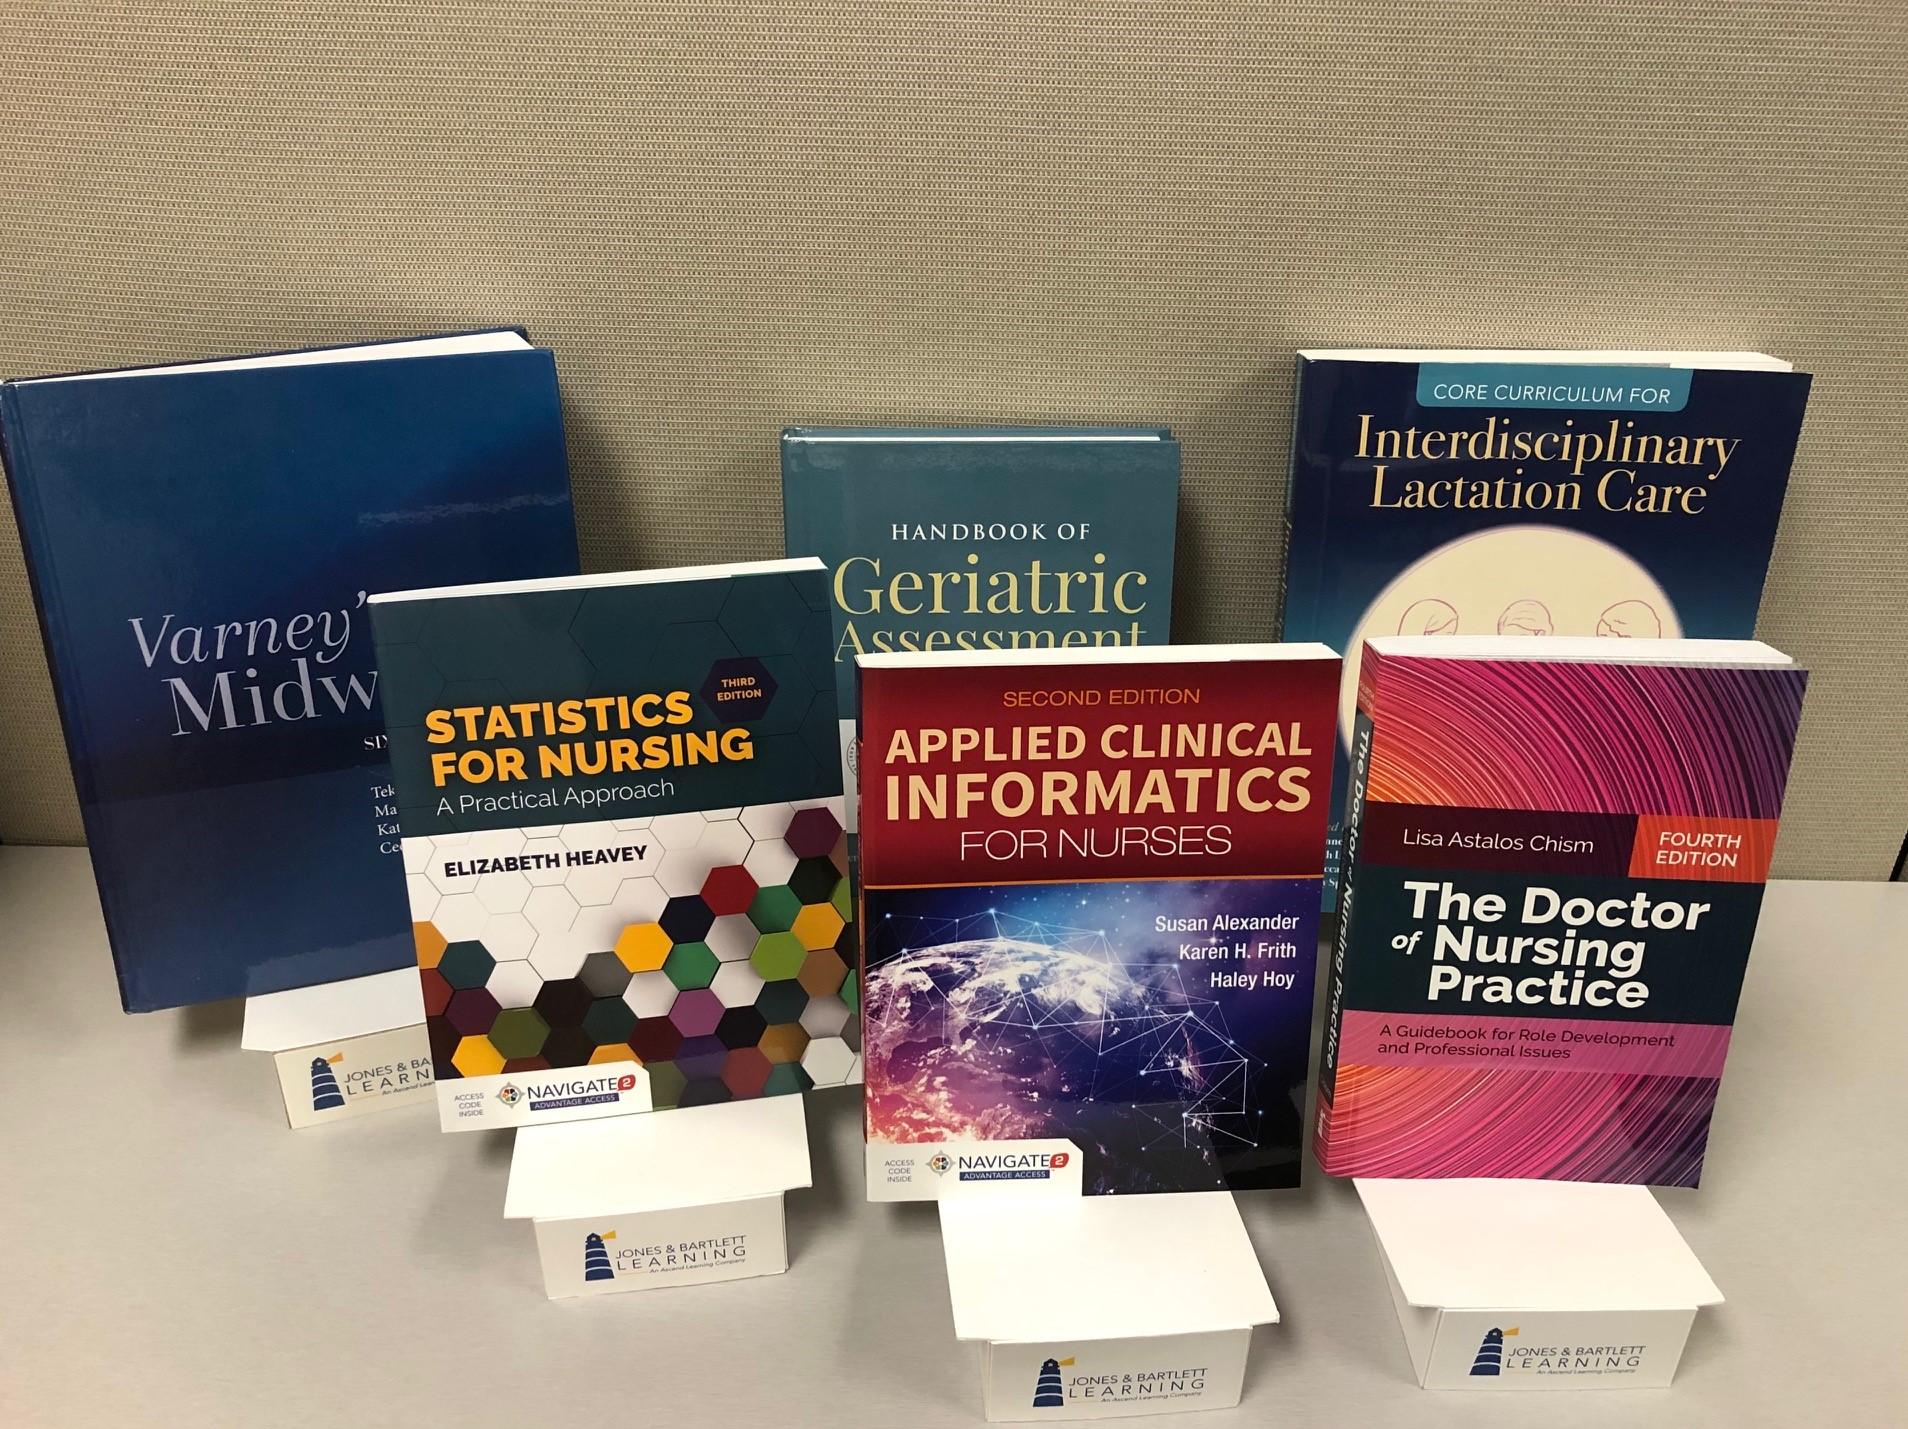 Jones & Bartlett Learning Awarded Seven AJN Book of the Year Awards